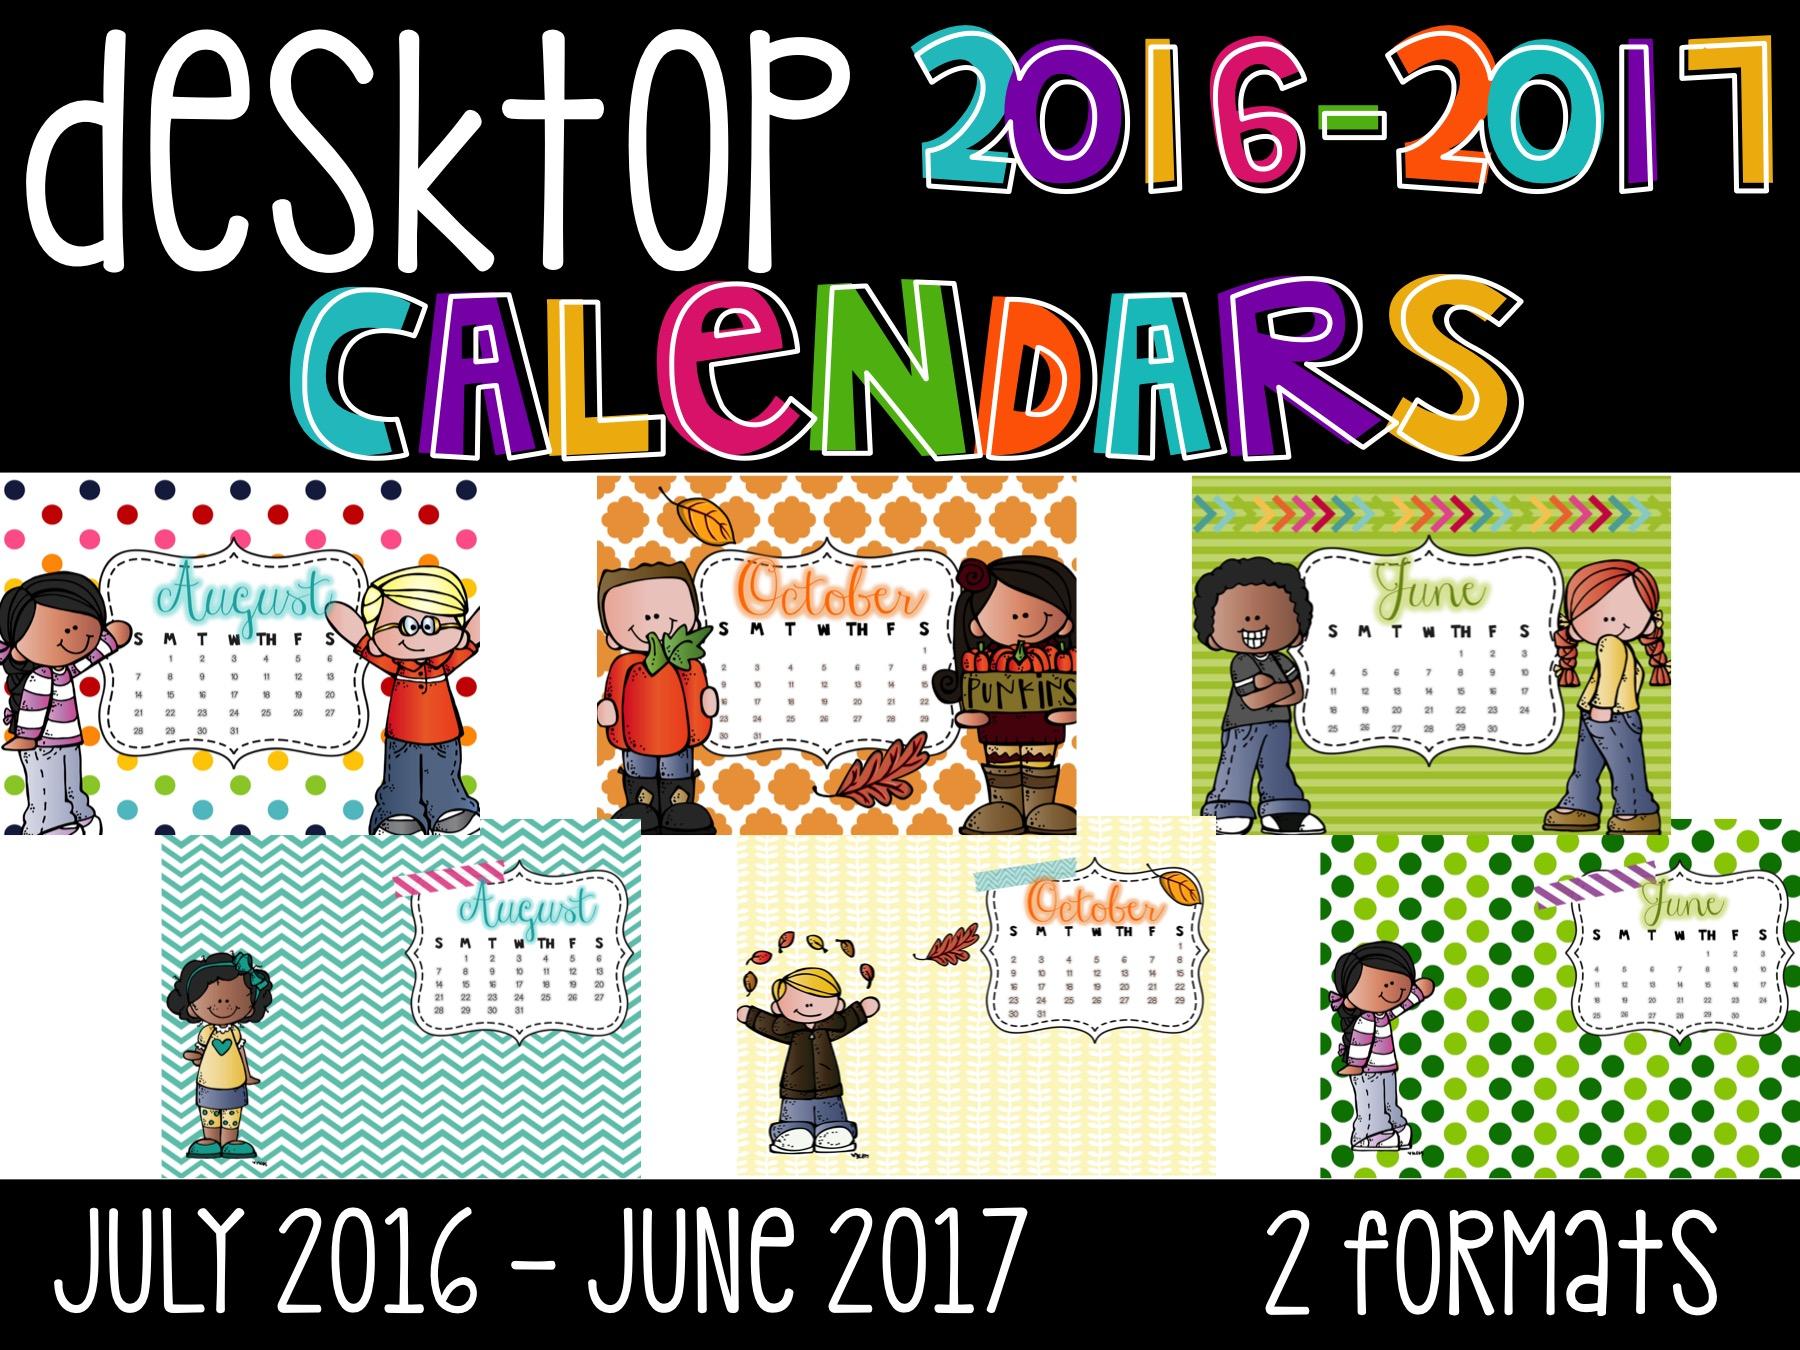 Desktop Calendars 2016-2017.jpg